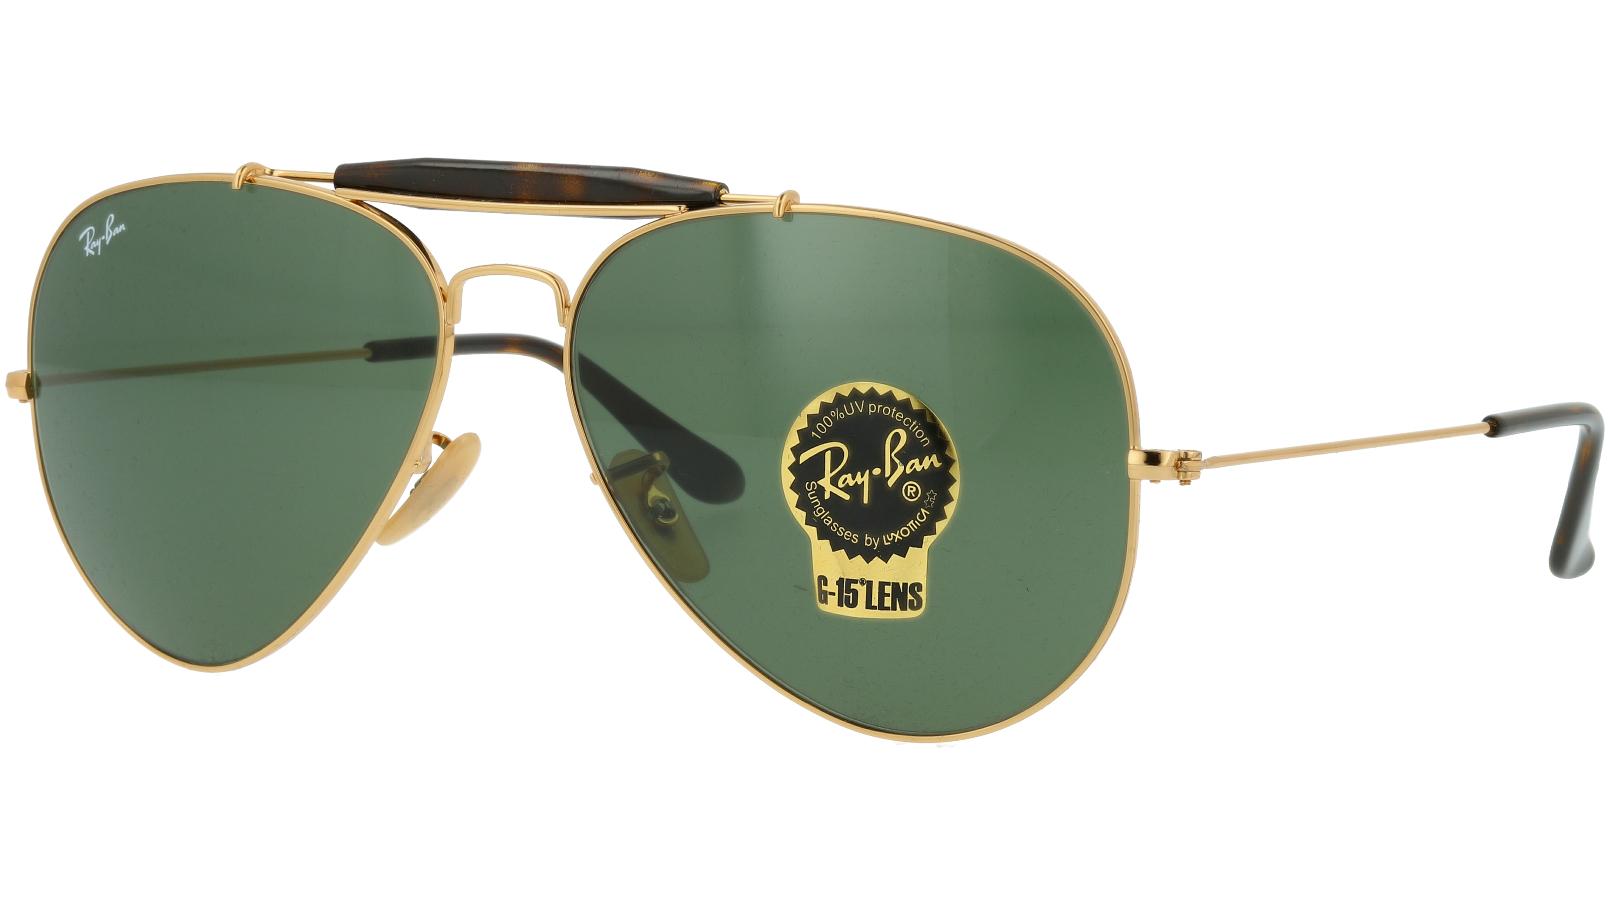 Ray-Ban RB3029 L2112 62 Arista Aviator Sunglasses